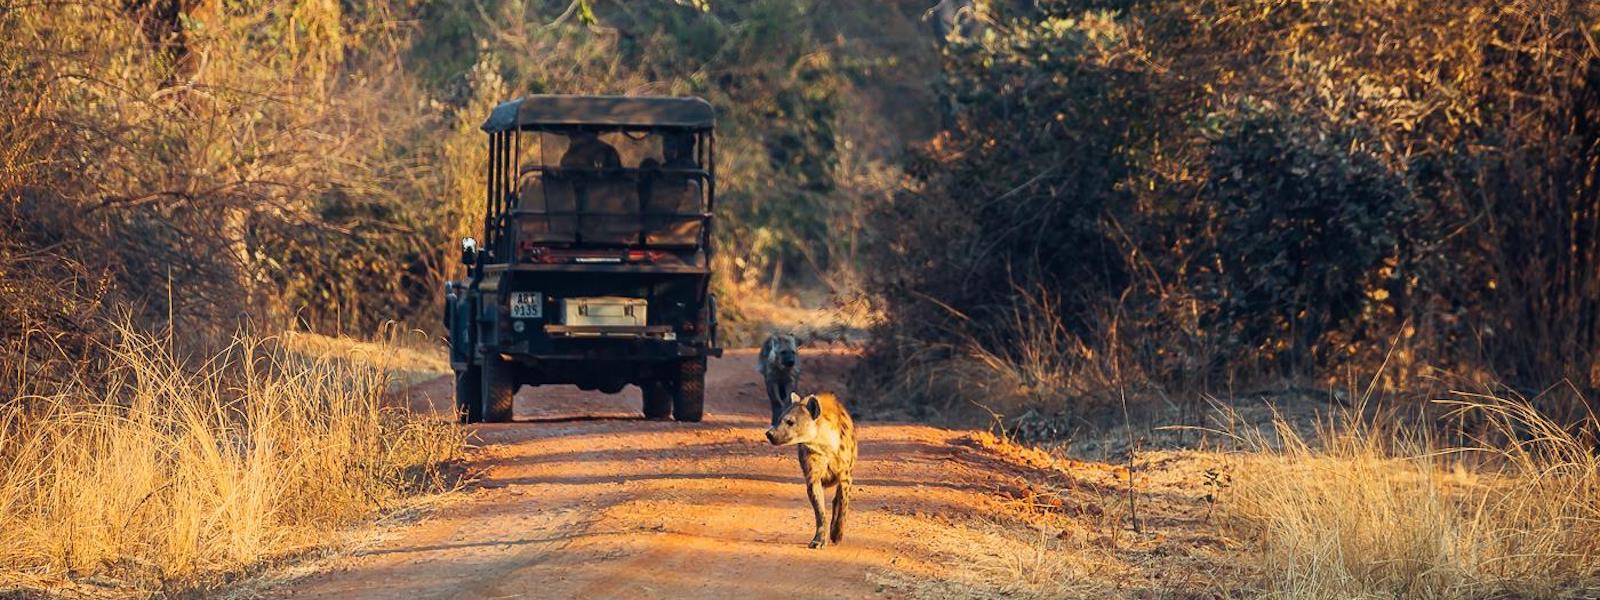 south luangwa safari vehicle and hyenas